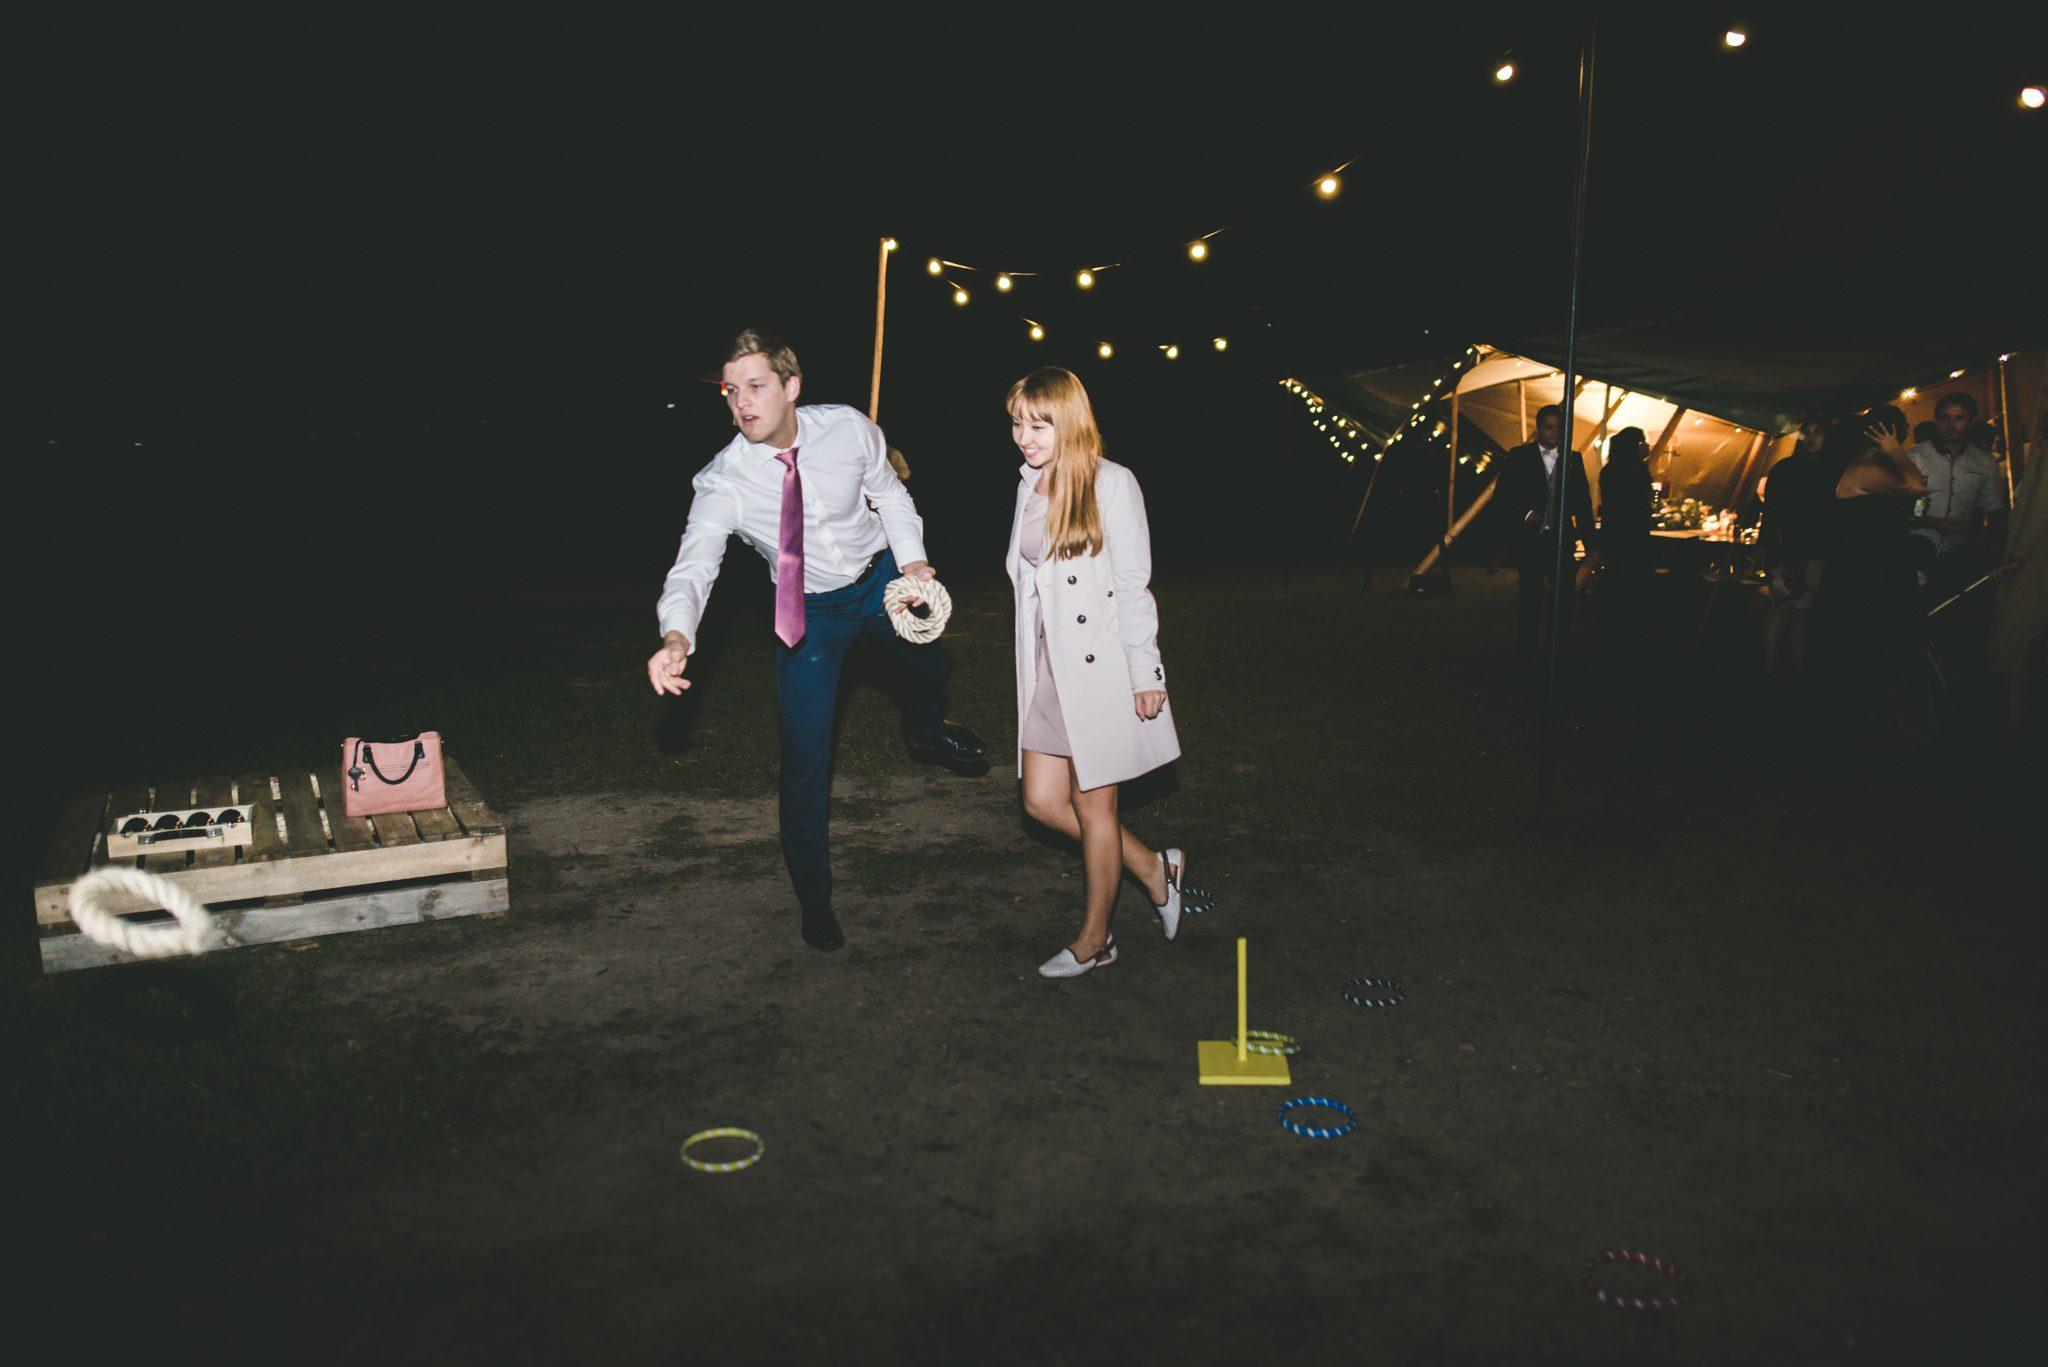 tipi wedding, gold coast, marquee hire, tipi hire, event hire, gold coast weddings